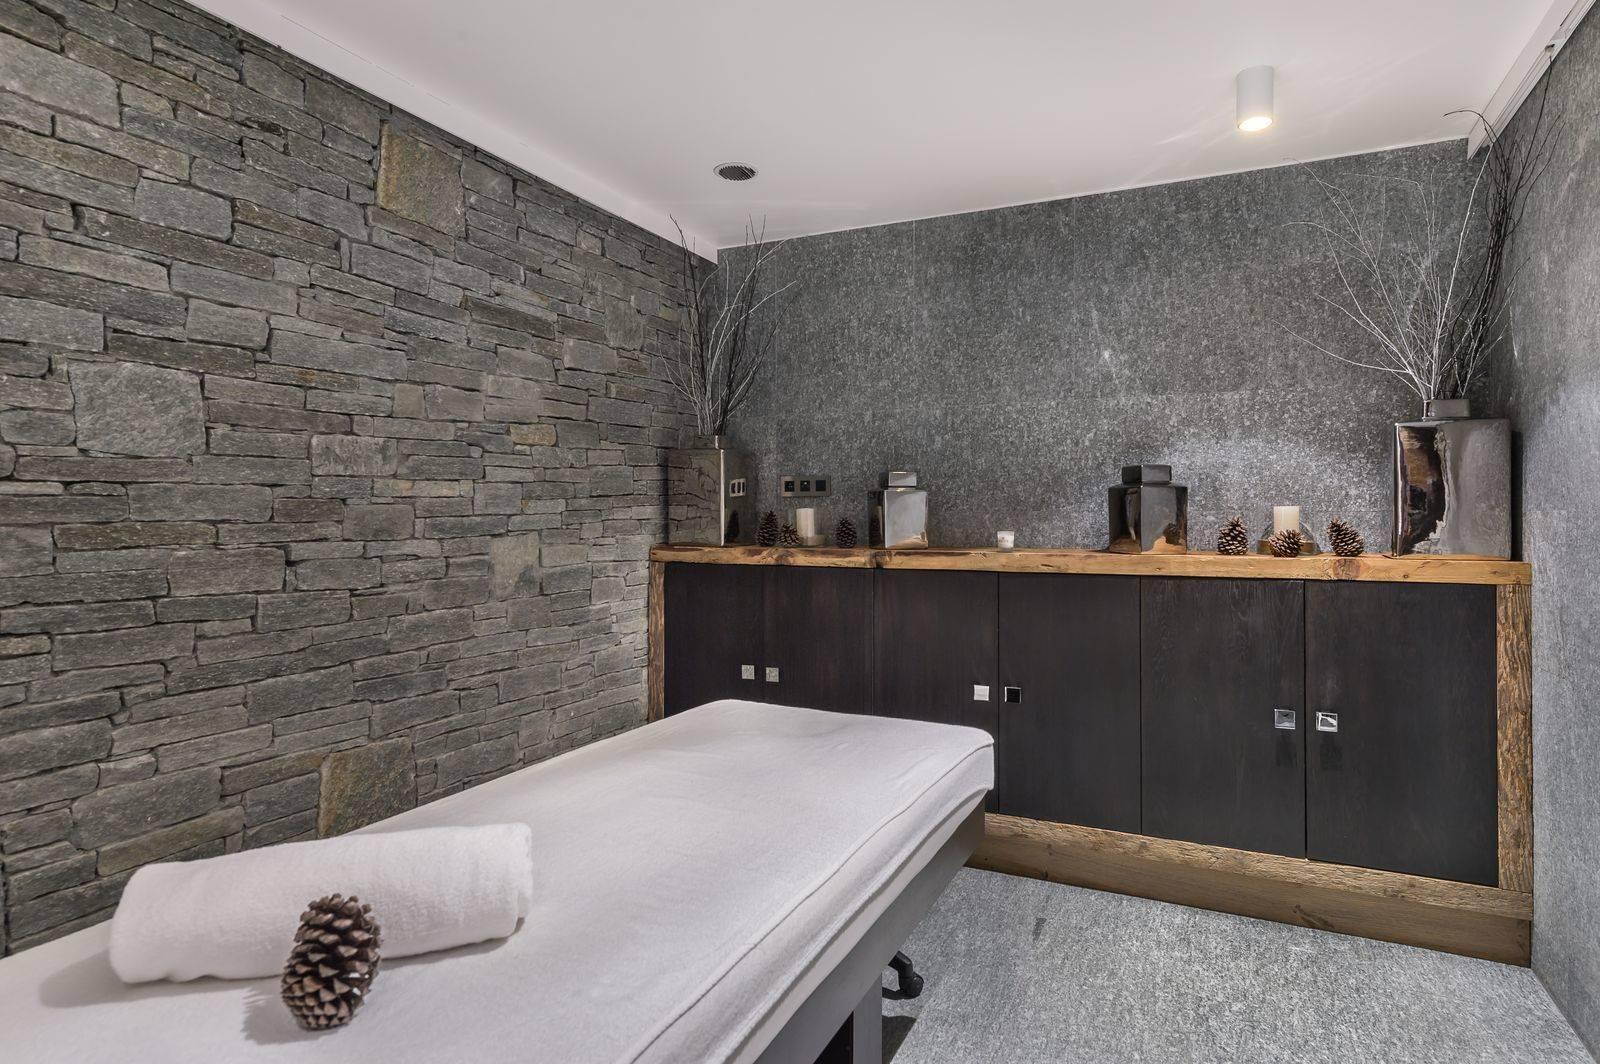 Lovelydays luxury service apartment rental - Megève - Senses Chalet - Partner - 6 bedrooms - 6 bathrooms - Design - 424121834817 - Lovelydays